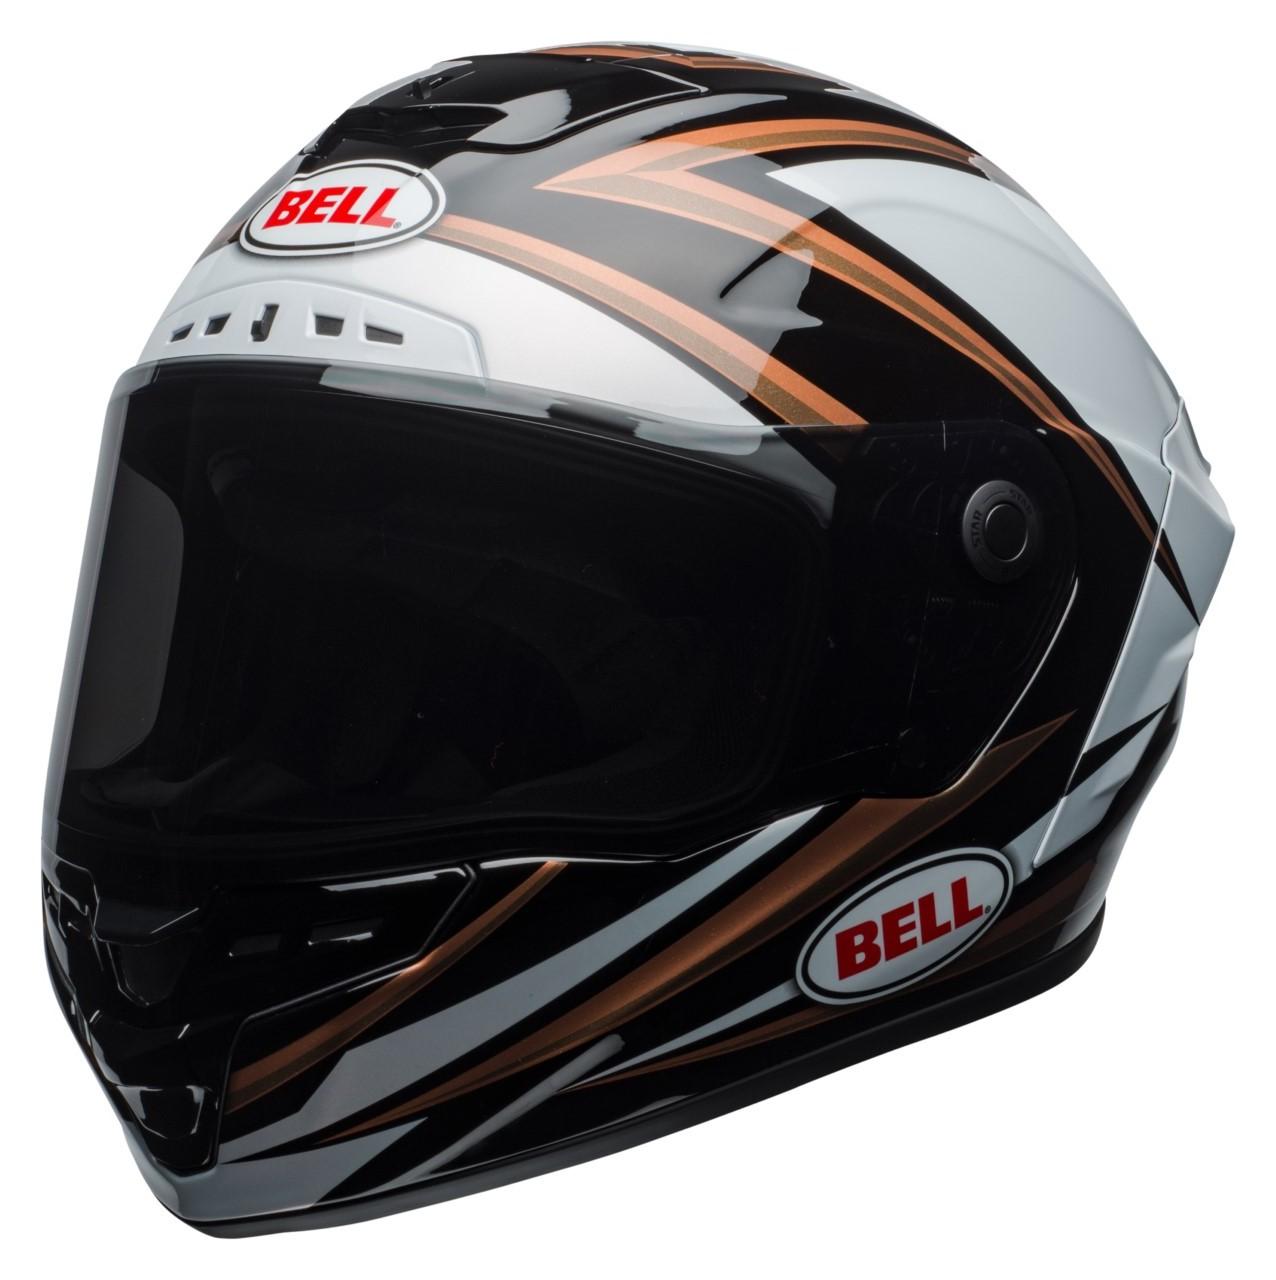 Bell Star MIPS Torsion Helmet - Closeout | 53% ($279.96) Off!